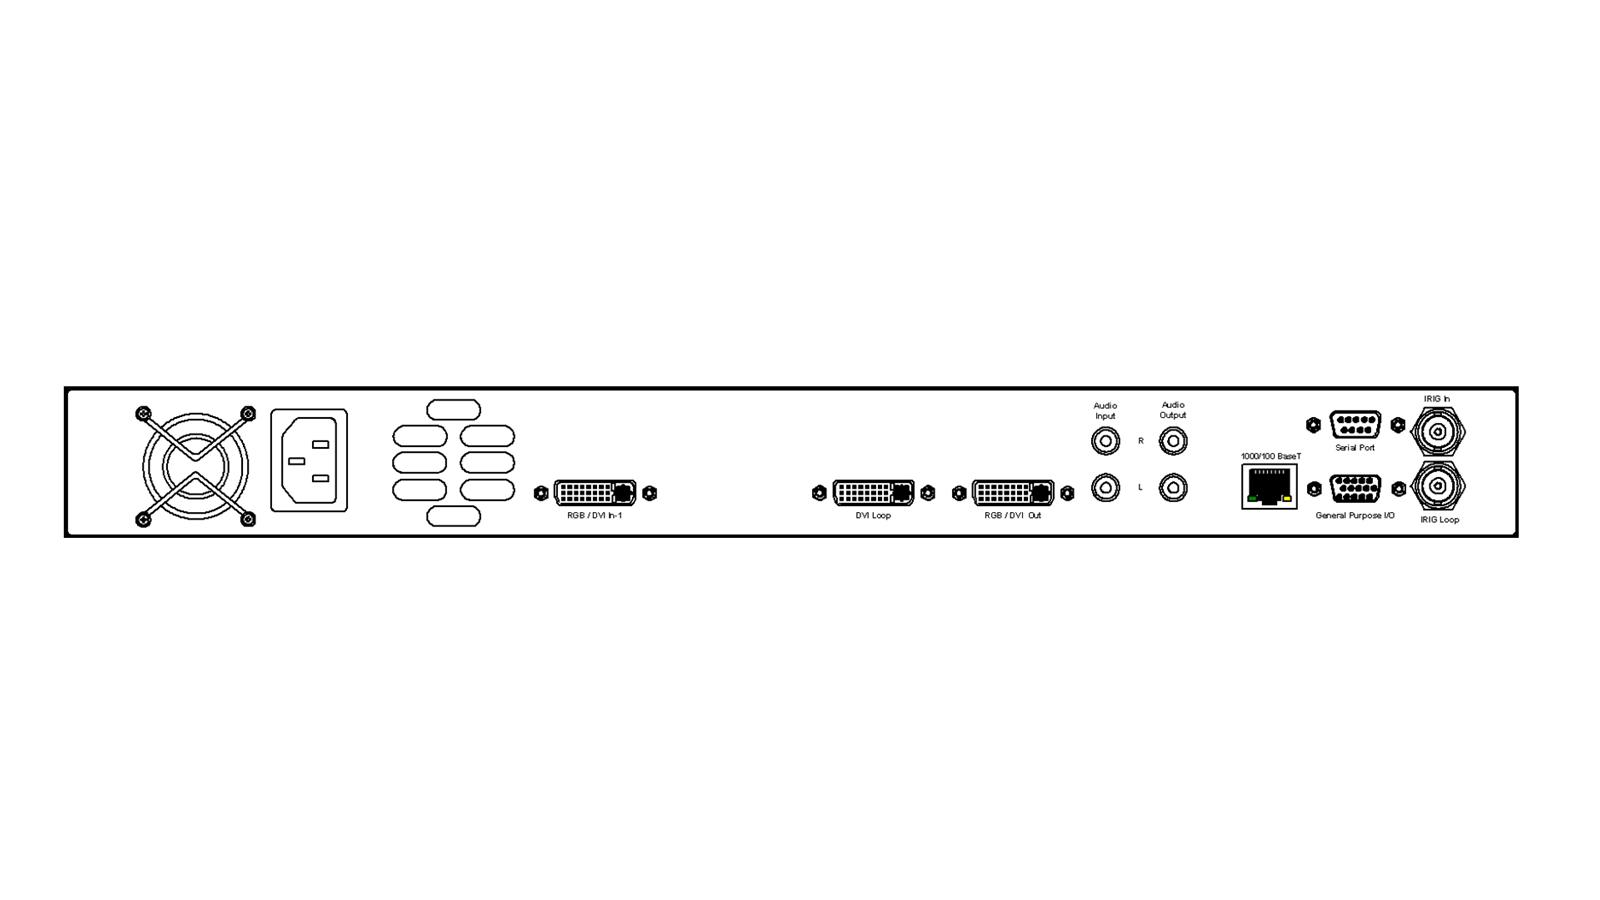 DGy Codec - back panel